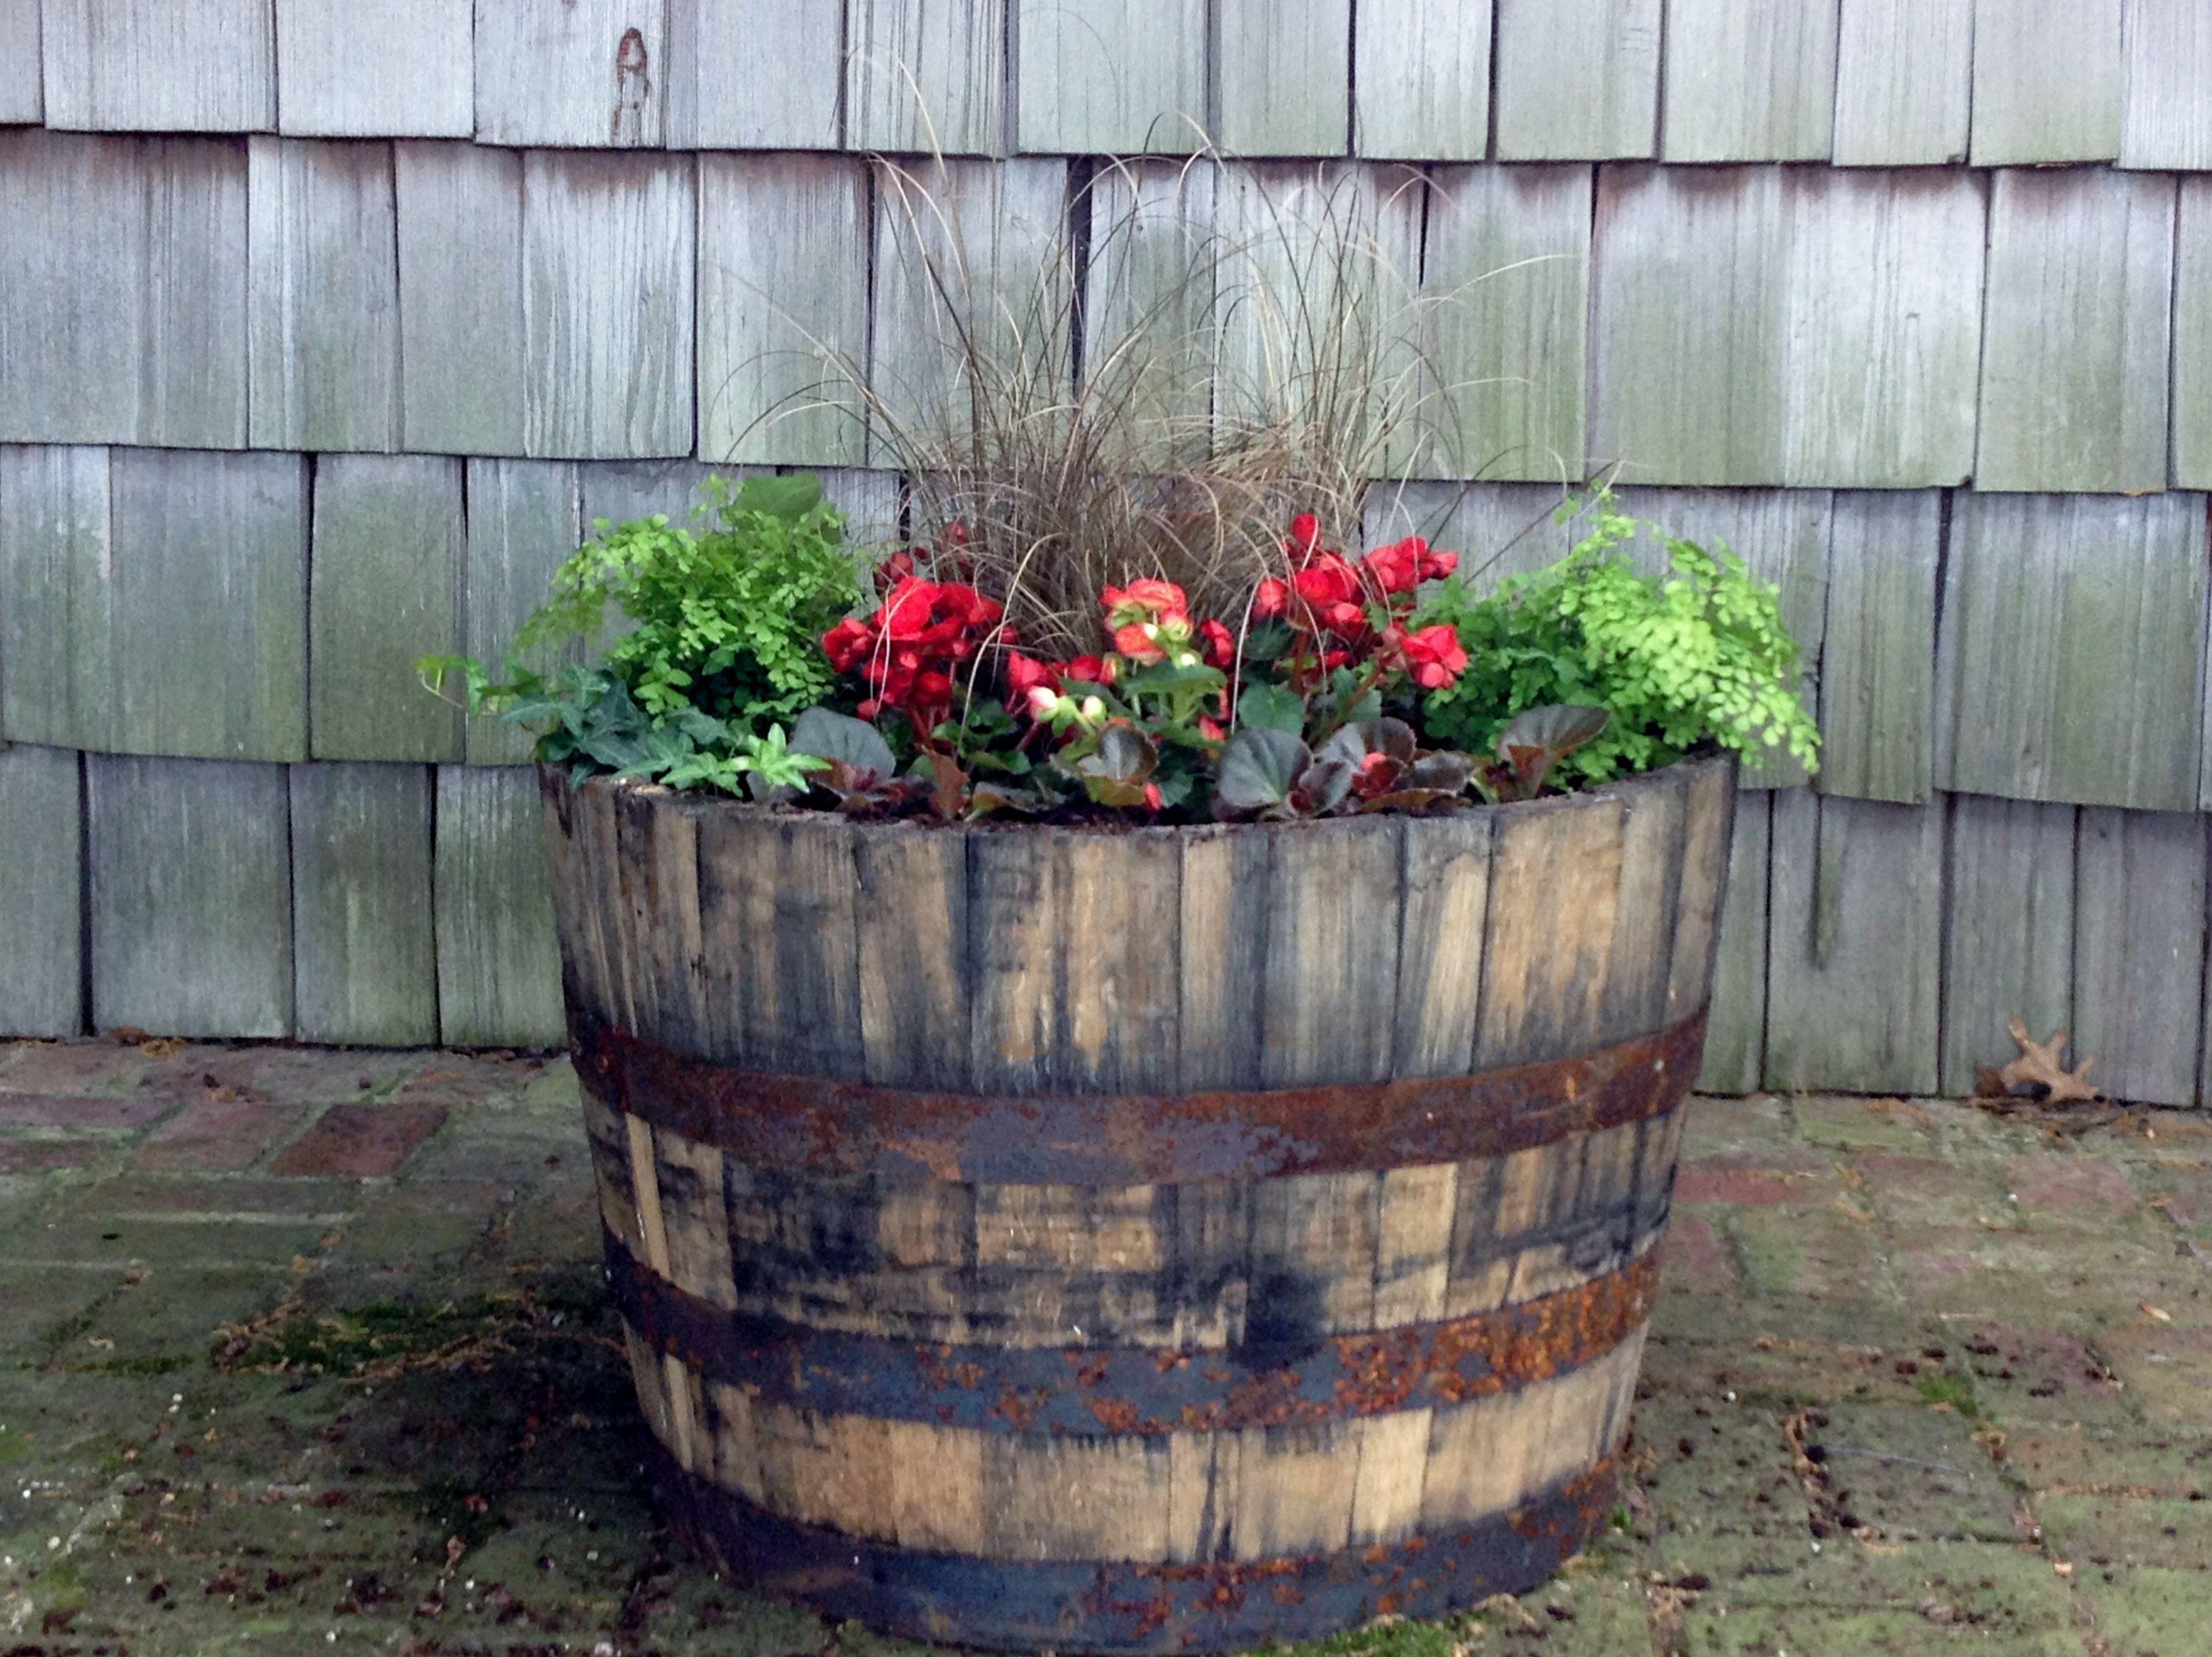 Whiskey barrel planter my planters yard ideas pinterest for Yard planter ideas